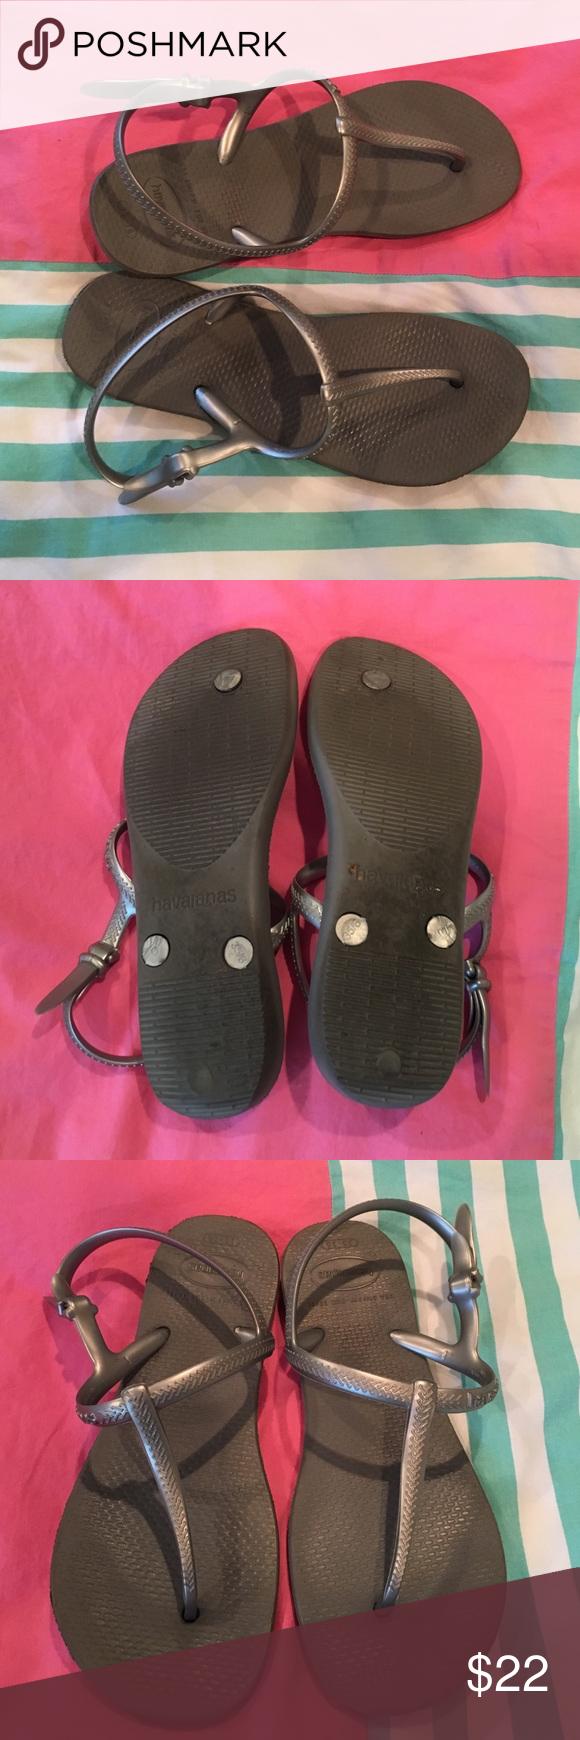 Sandals shoes usa - Silver Havaianas Sandals Havaianas Shoesusashoes Sandals